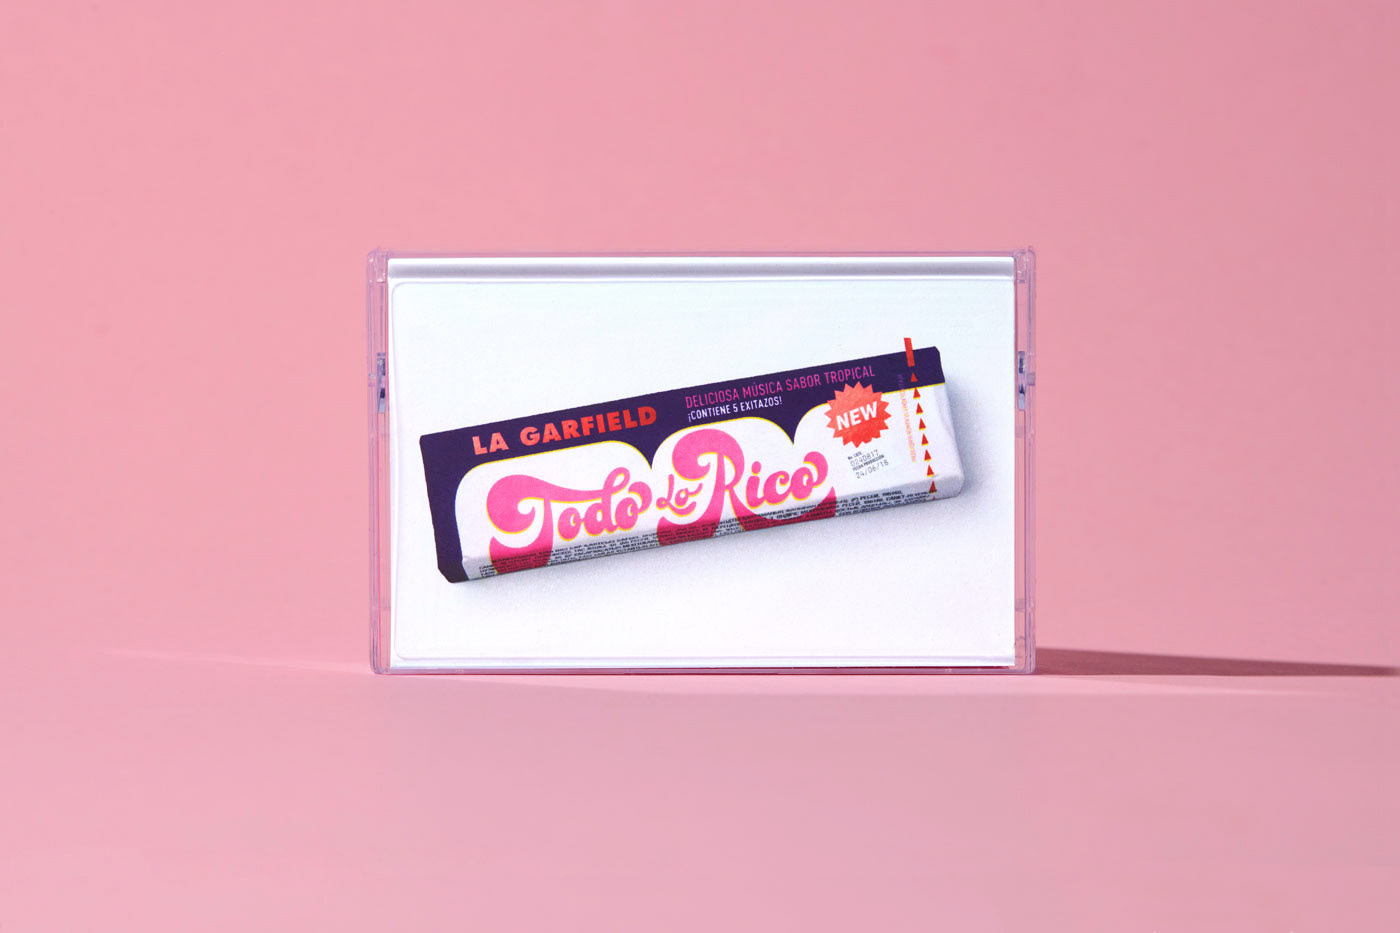 anagramastudio branding  Packaging mexico lagarfield todolorico Candy music vinyl cassette